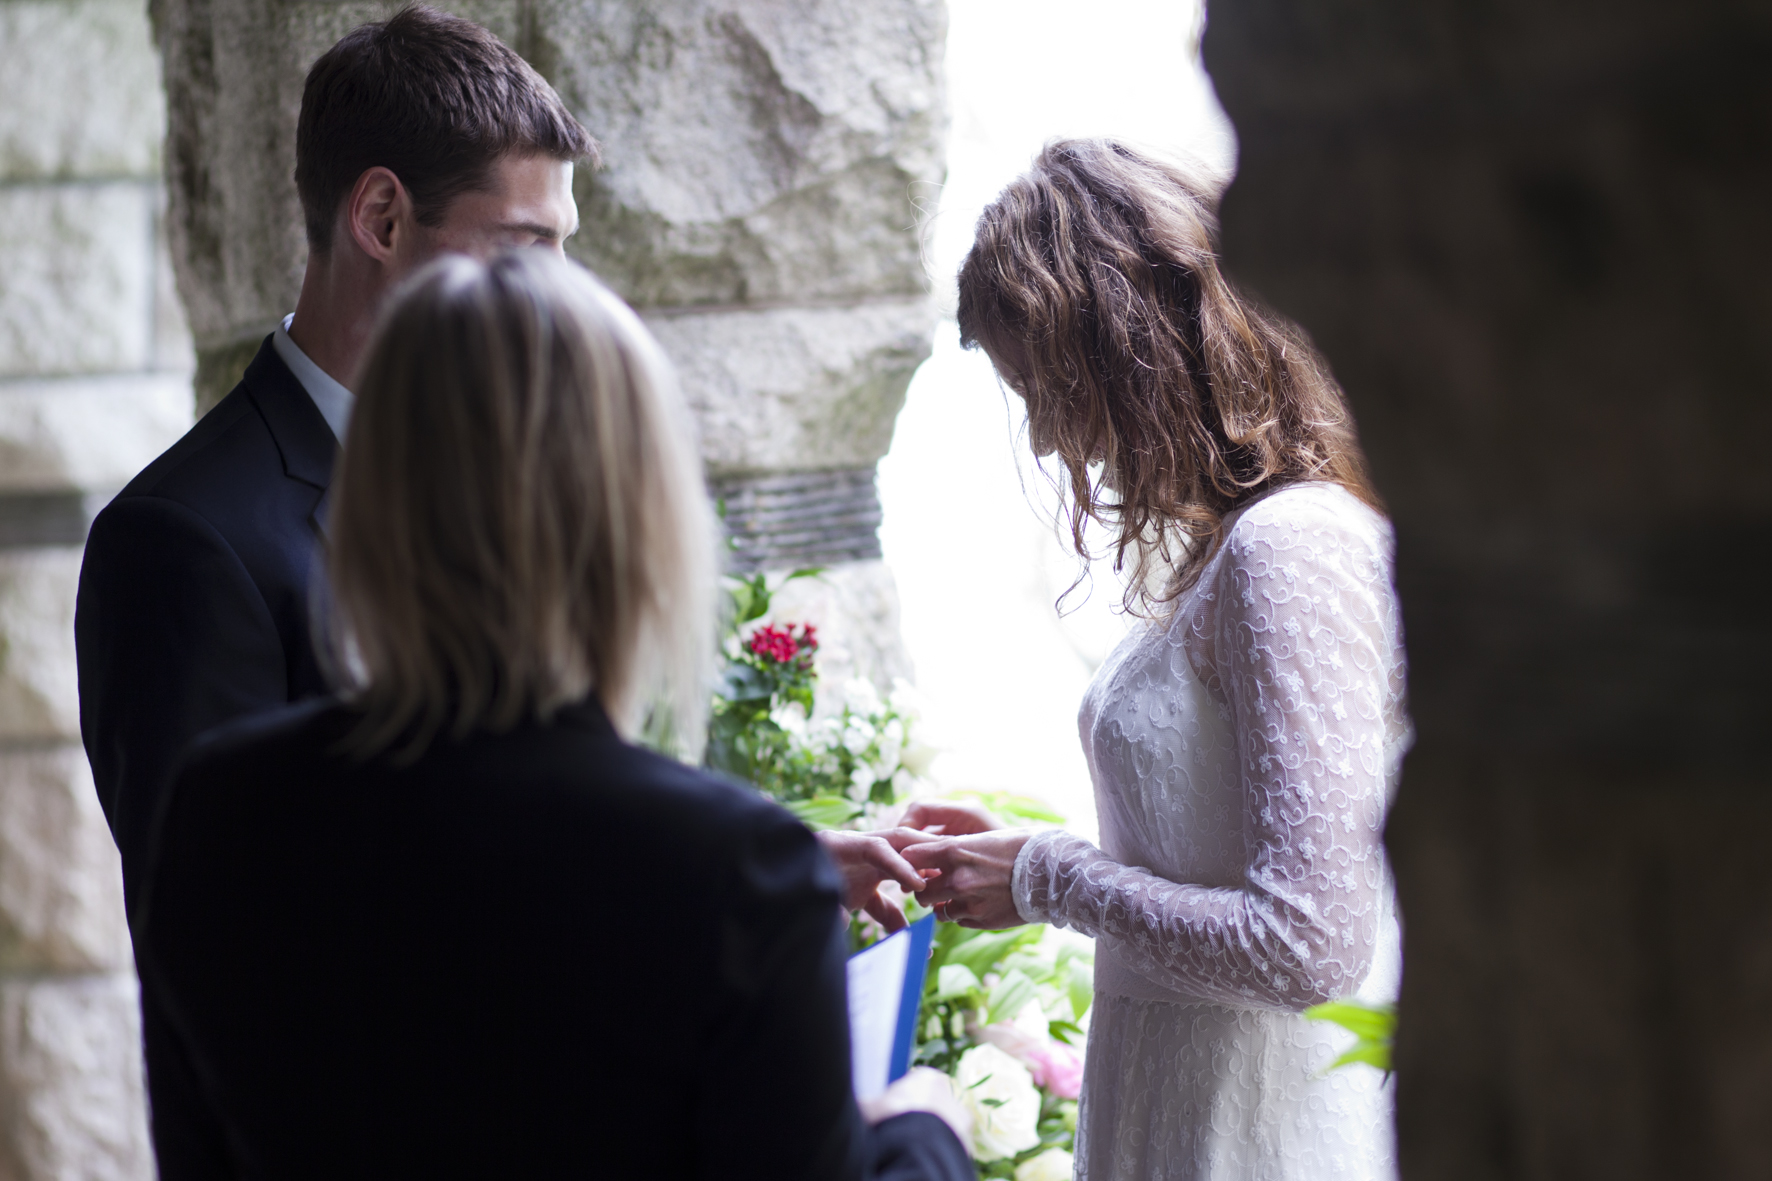 Wedding example_M&P__MG_3414_Claudia Leisinger.jpg